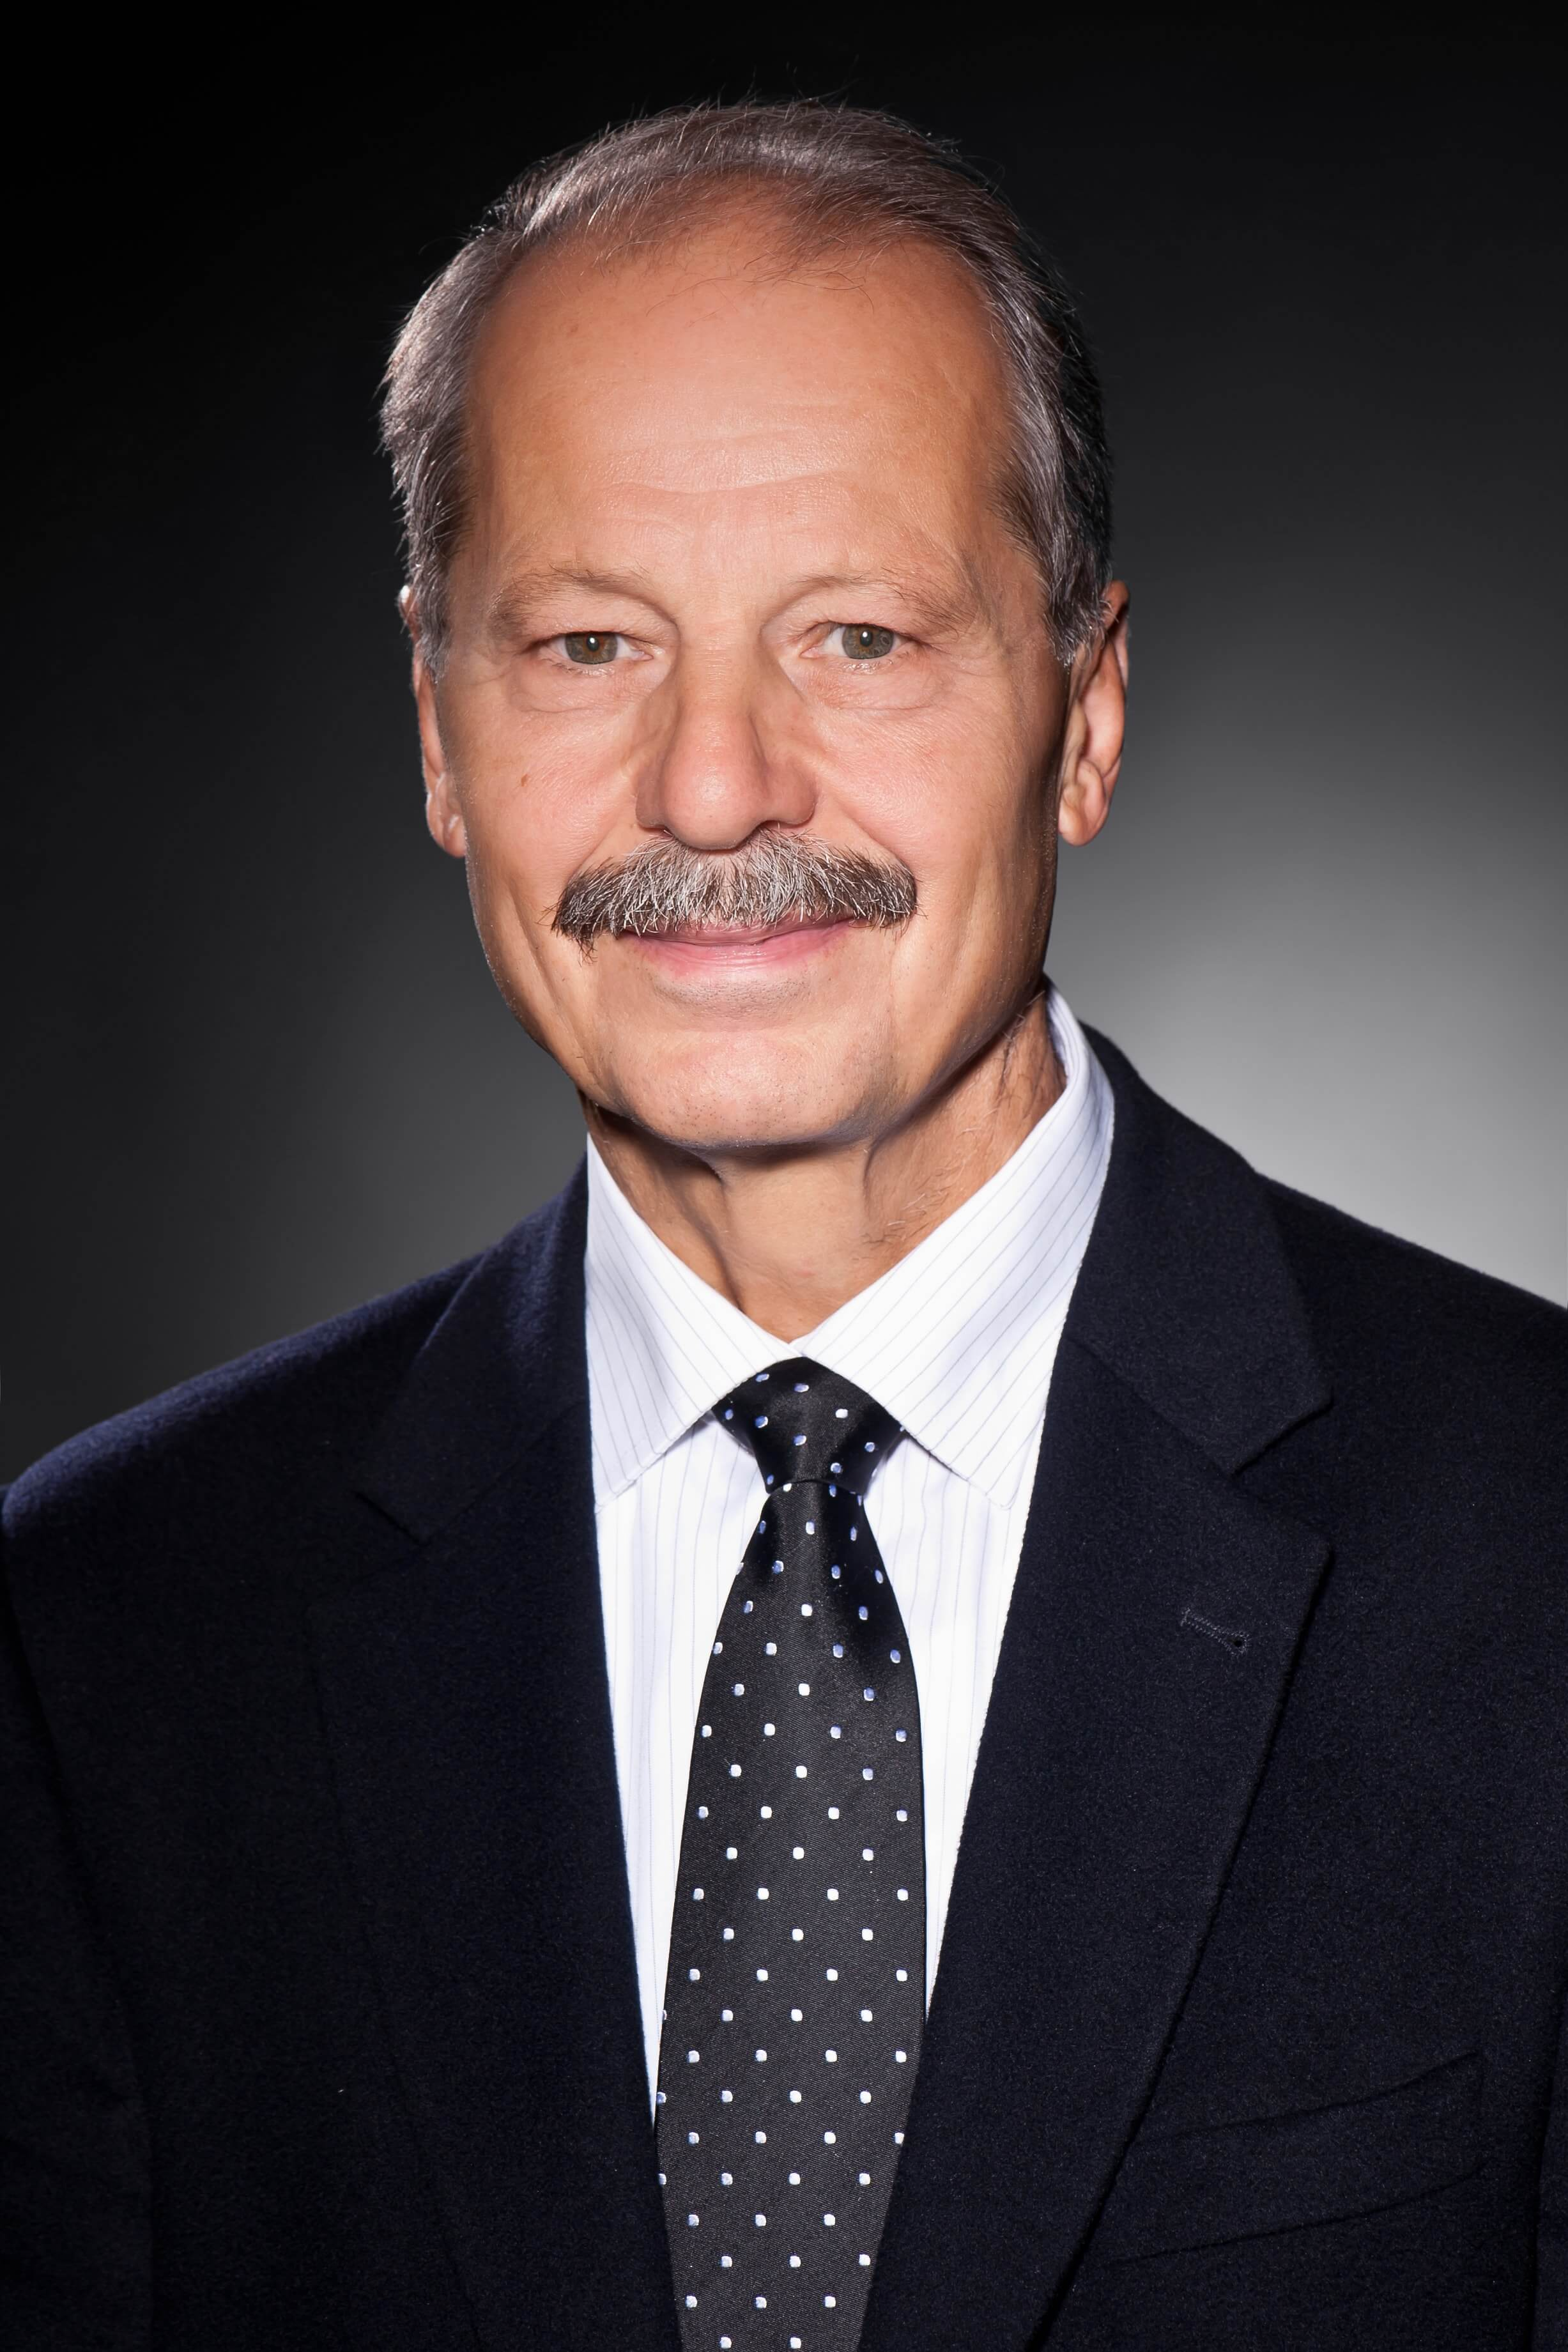 Joseph R. von Ranke